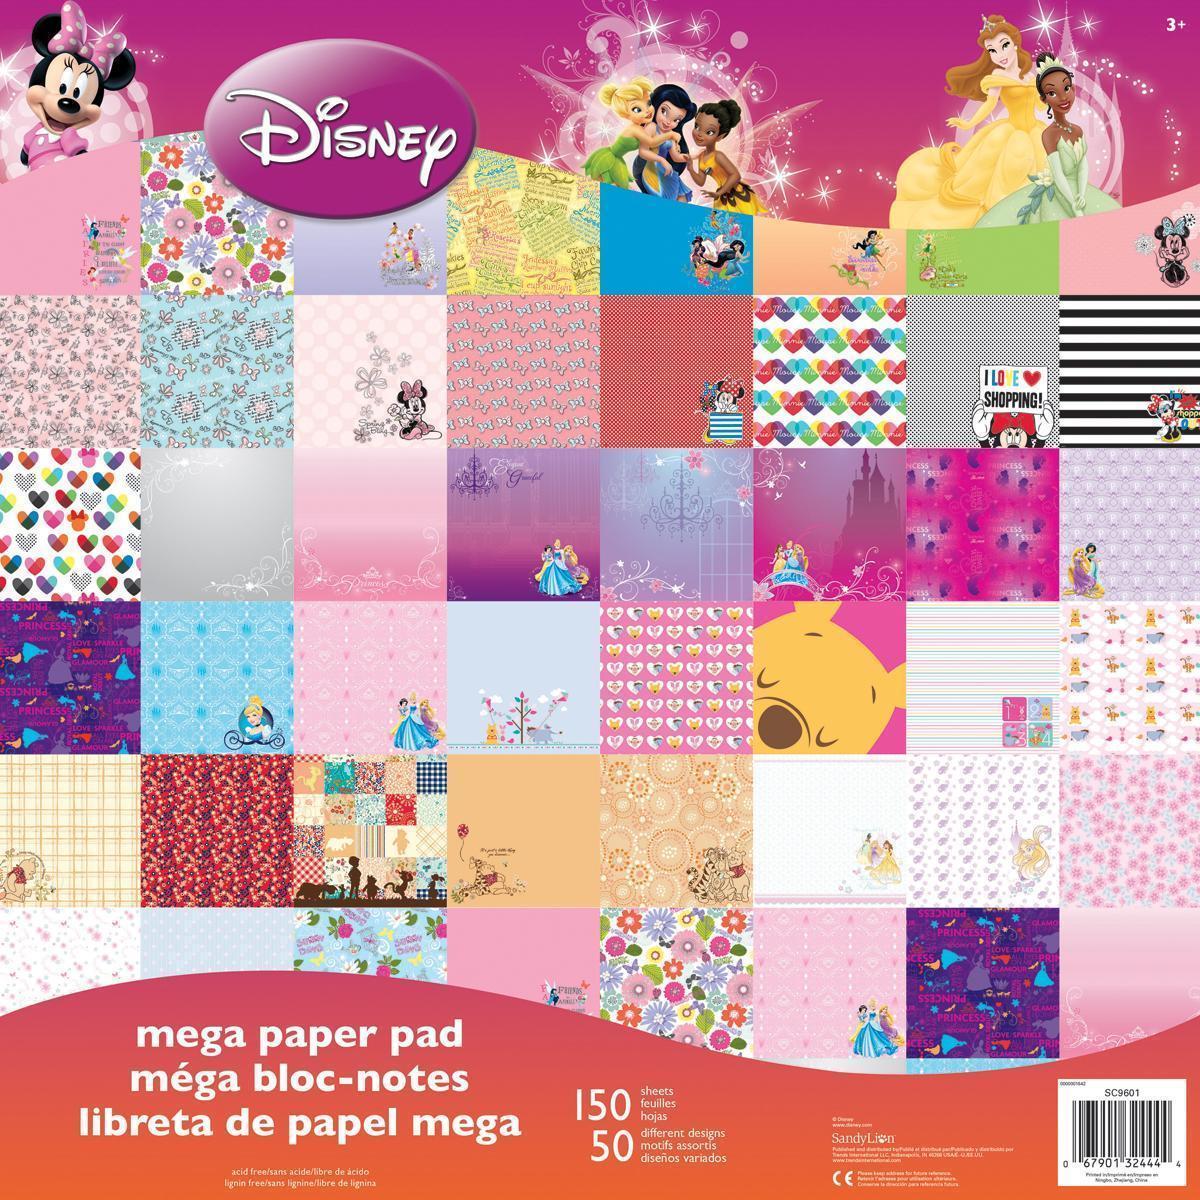 Disney Mega Paper Pad 12 X12 150/Sheets - Girl, 50 Design...